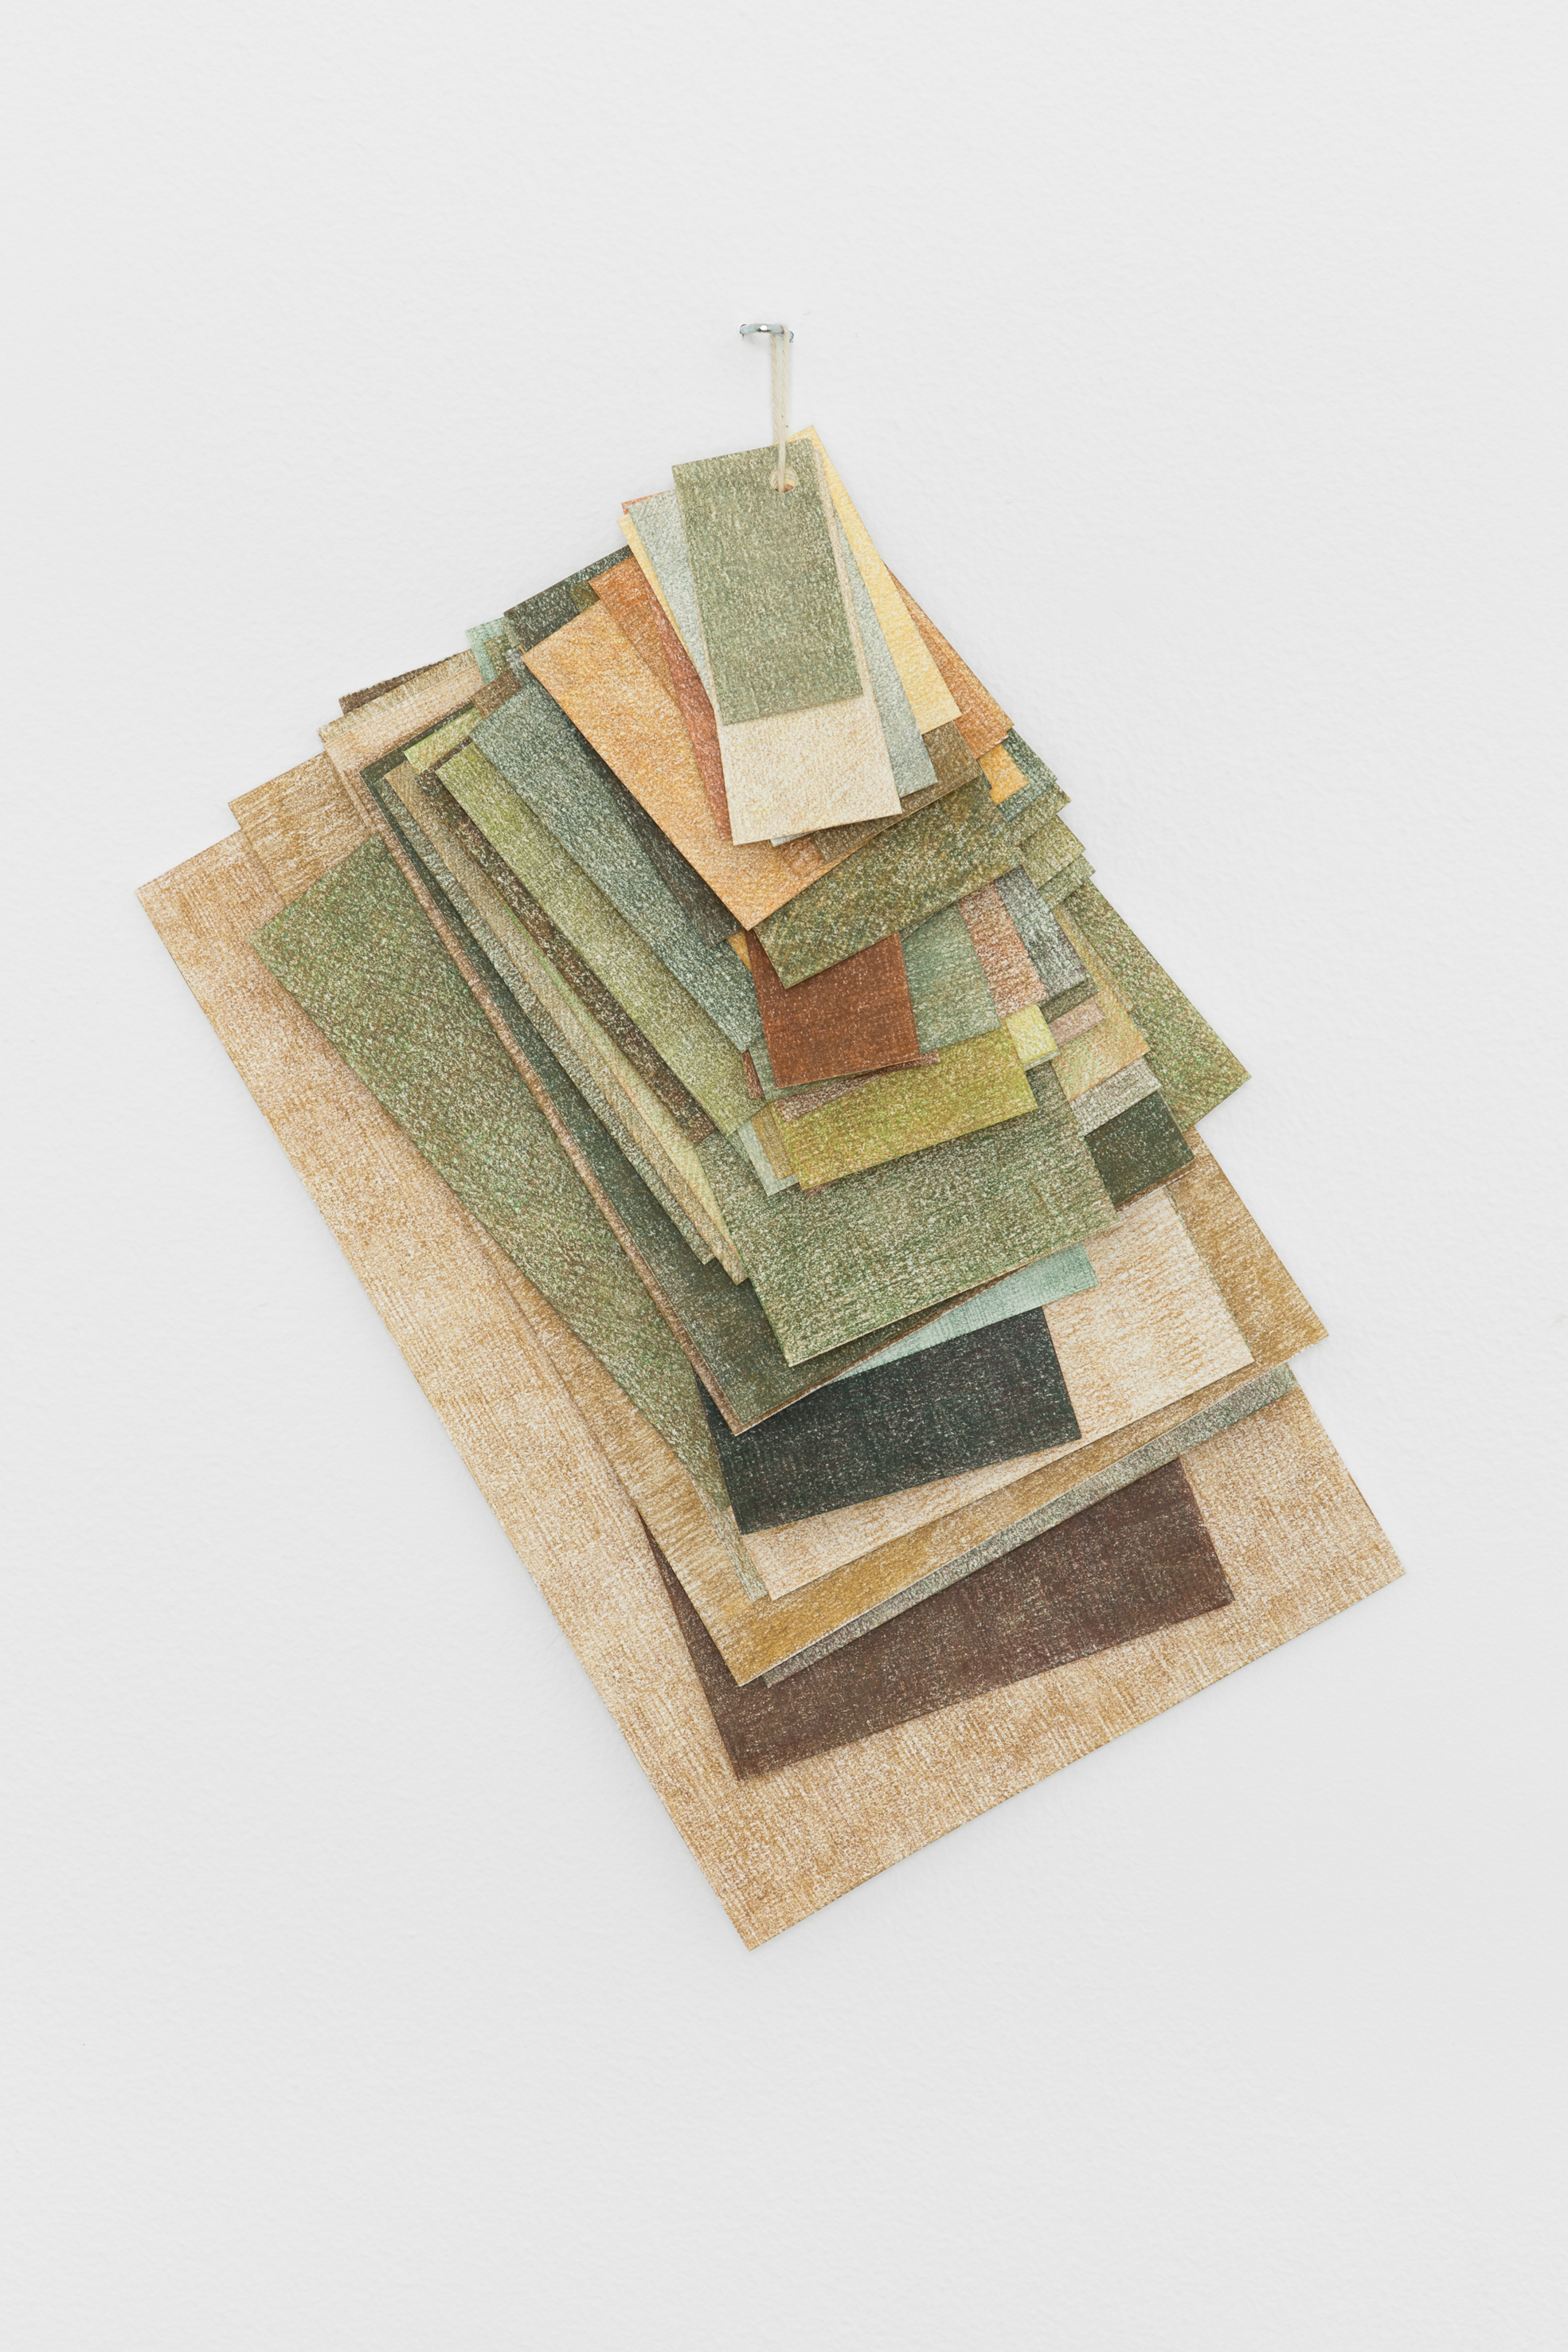 Gabriela Albergaria - Time scales-10.jpg